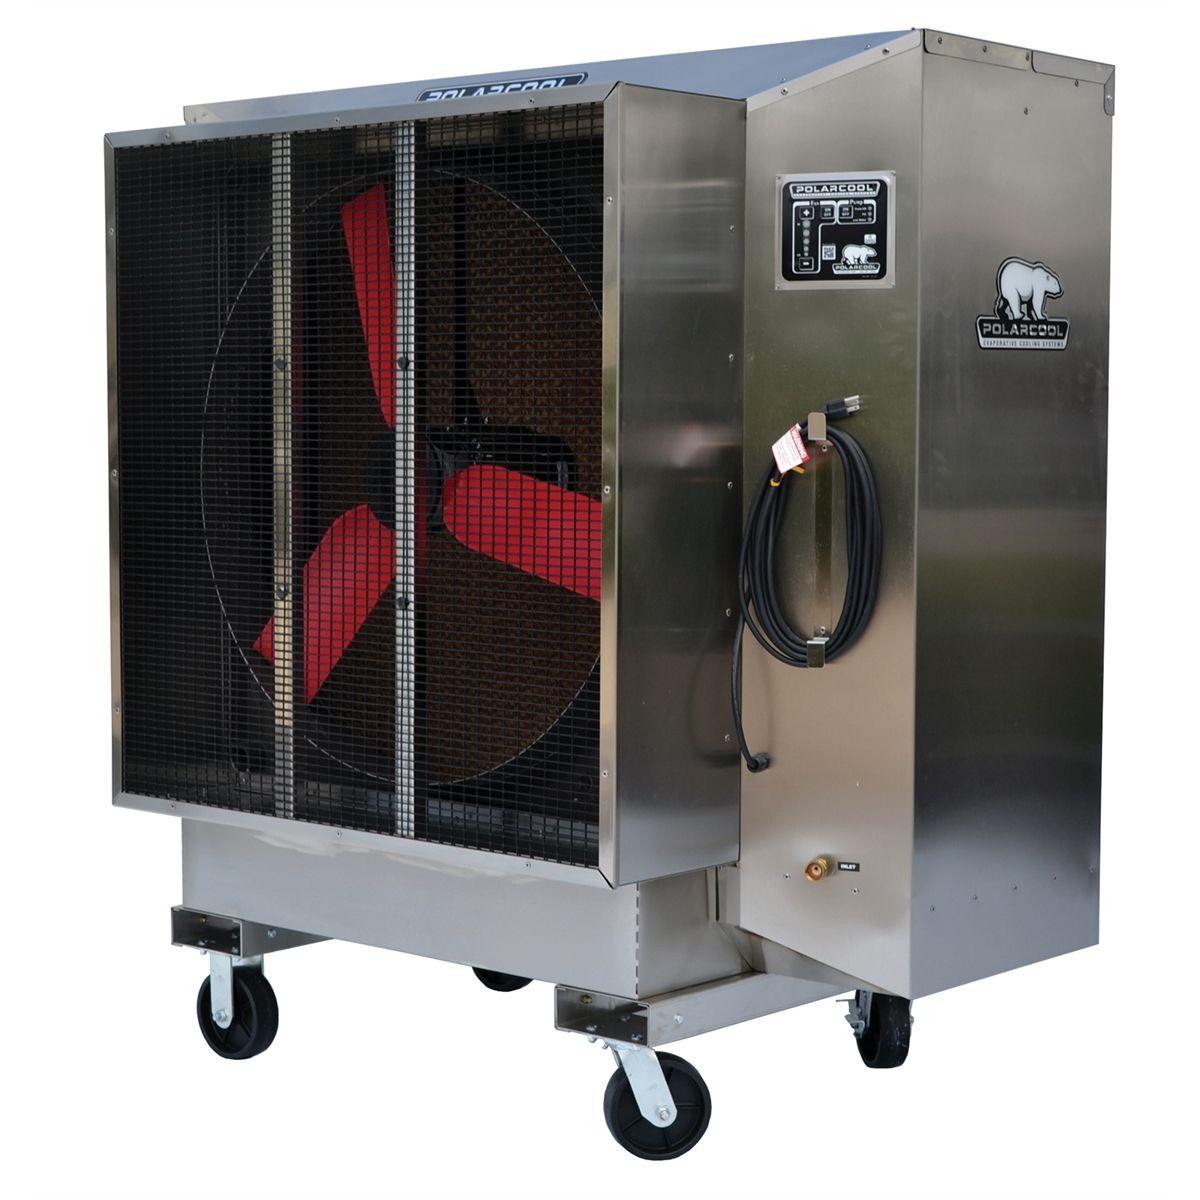 Evaporative Cooling Units : Polarcool portable evaporative cooling system